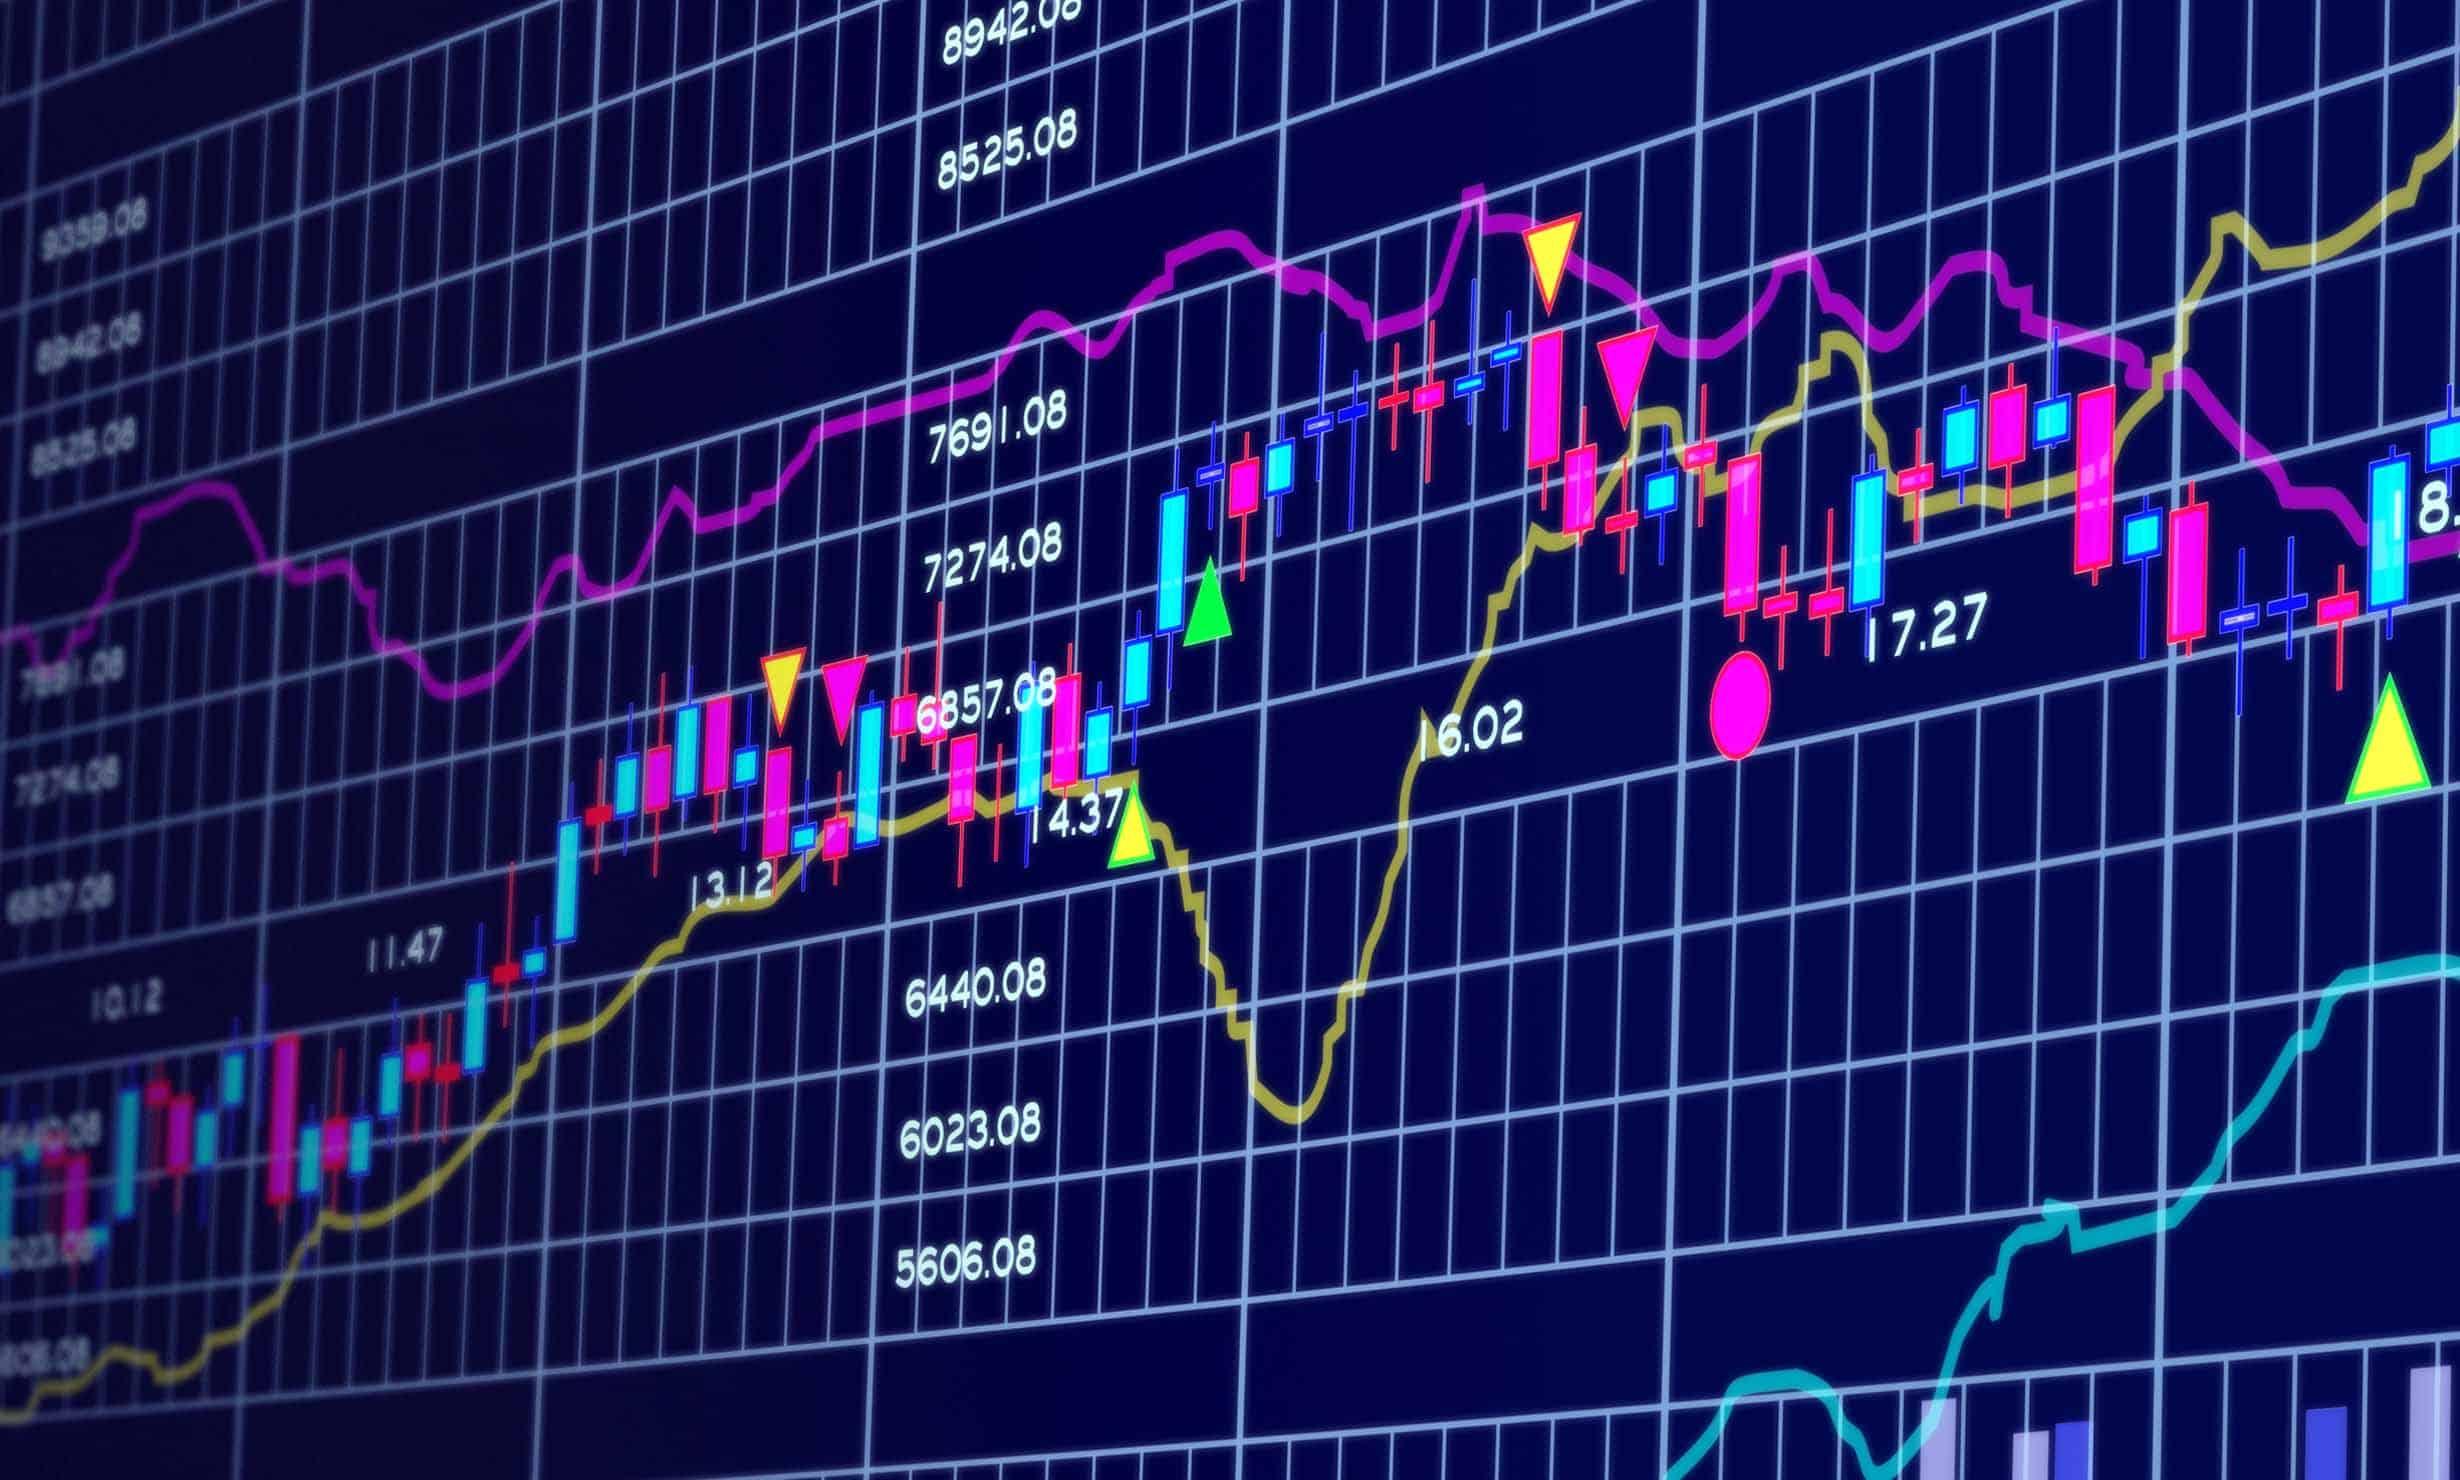 Apprendre à trader rapidement : nos conseils